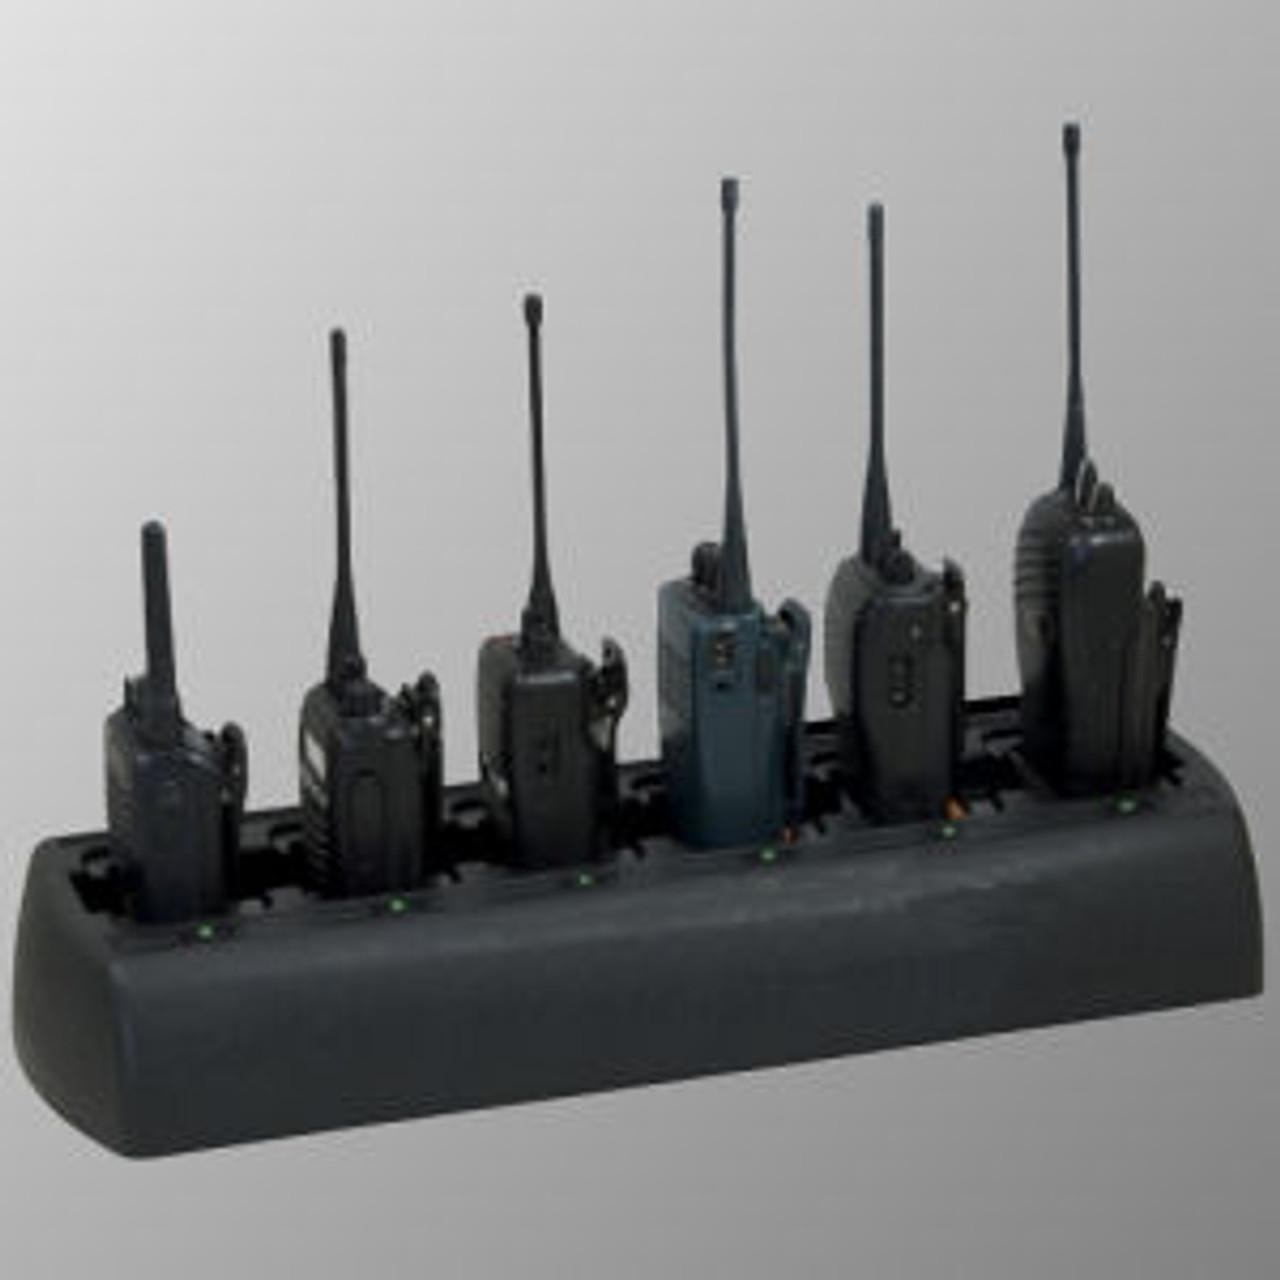 GE / Ericsson 700P Slim Line 6-Slot Lithium Drop-In Charger